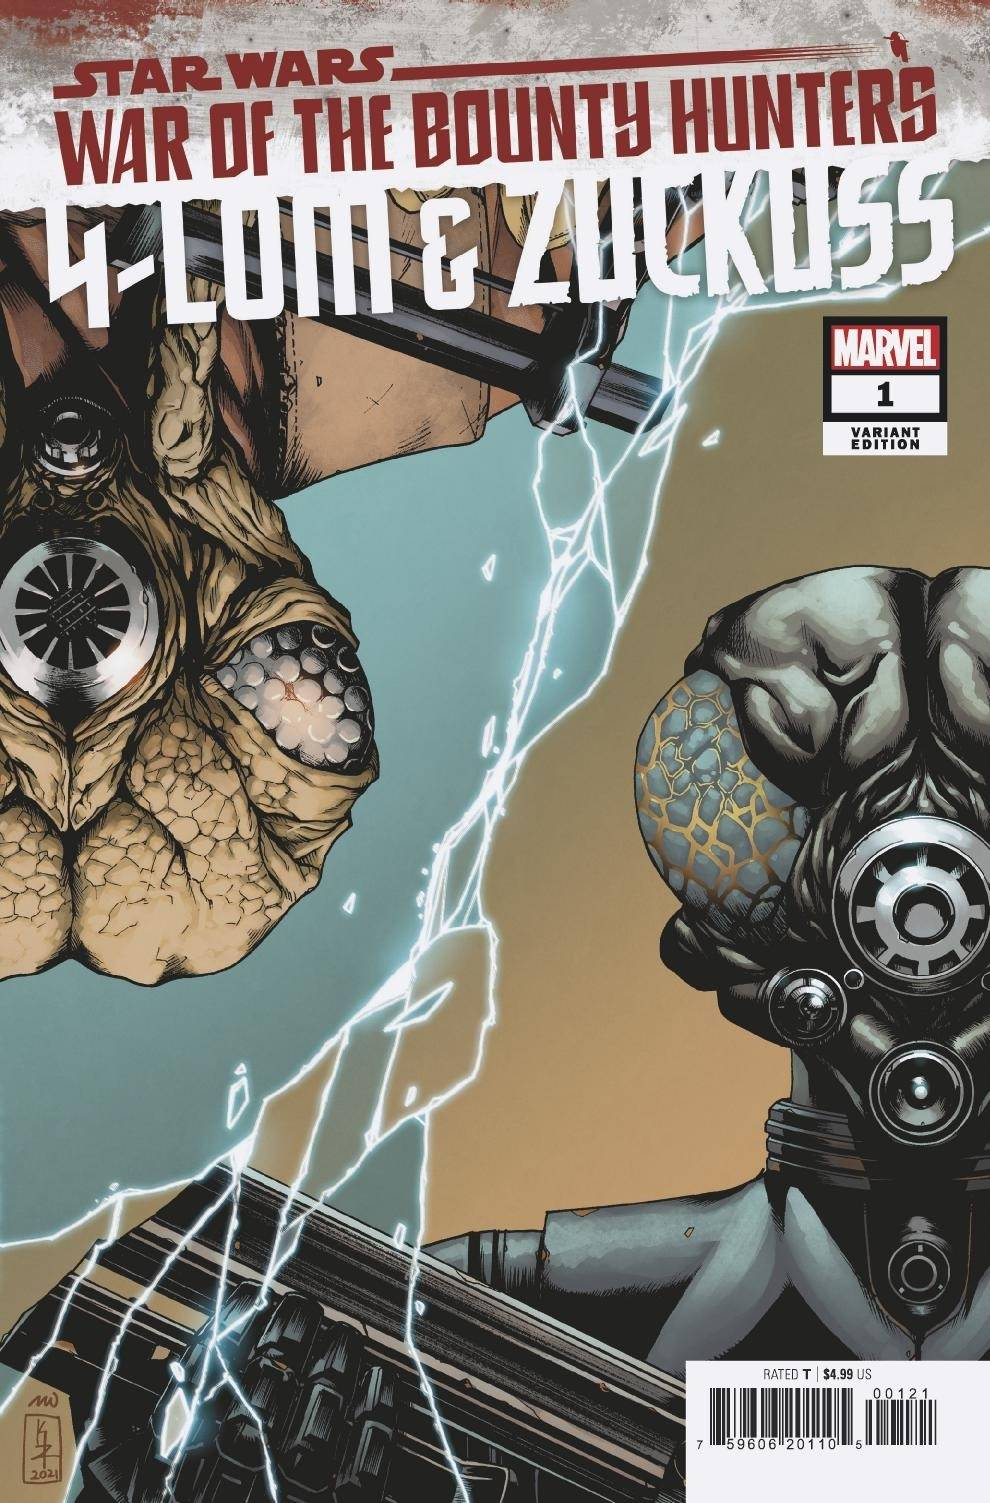 War of the Bounty Hunters: 4-LOM & Zuckuss #1 (Kei Zama Variant Cover) (04.08.2021)